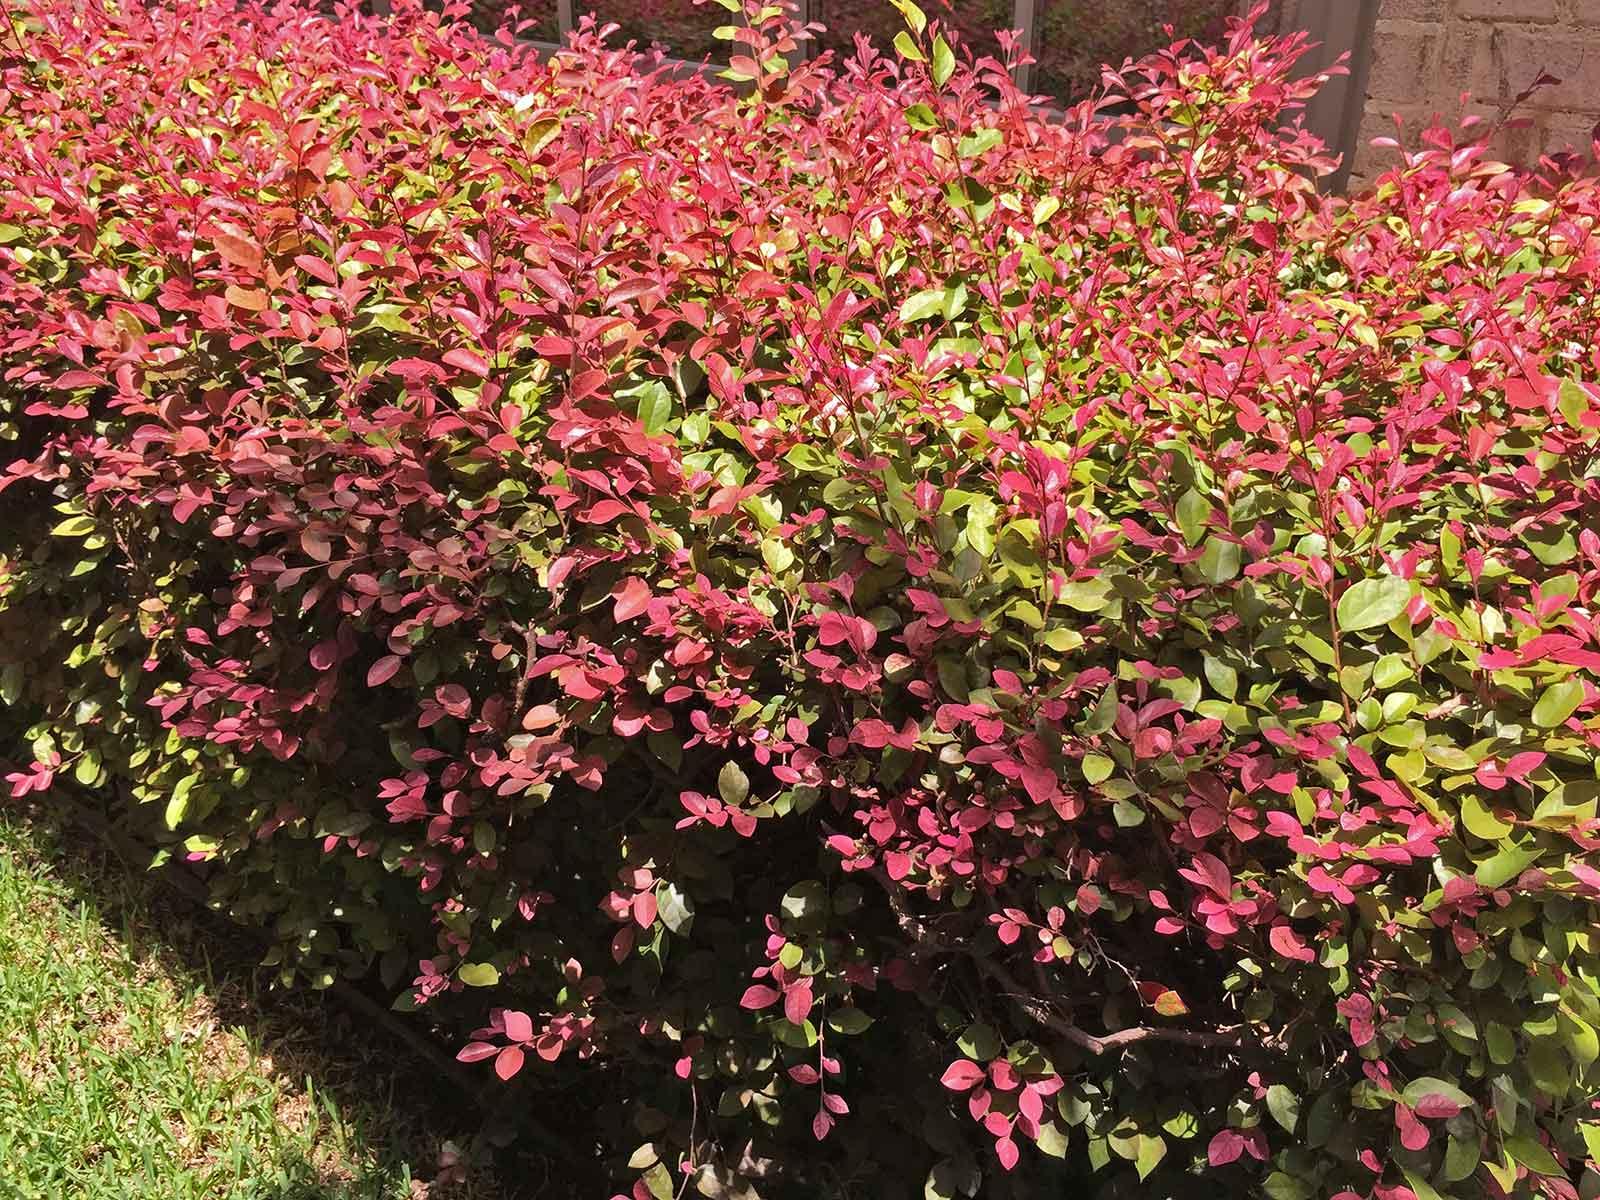 loropetalum-shrub-leaves